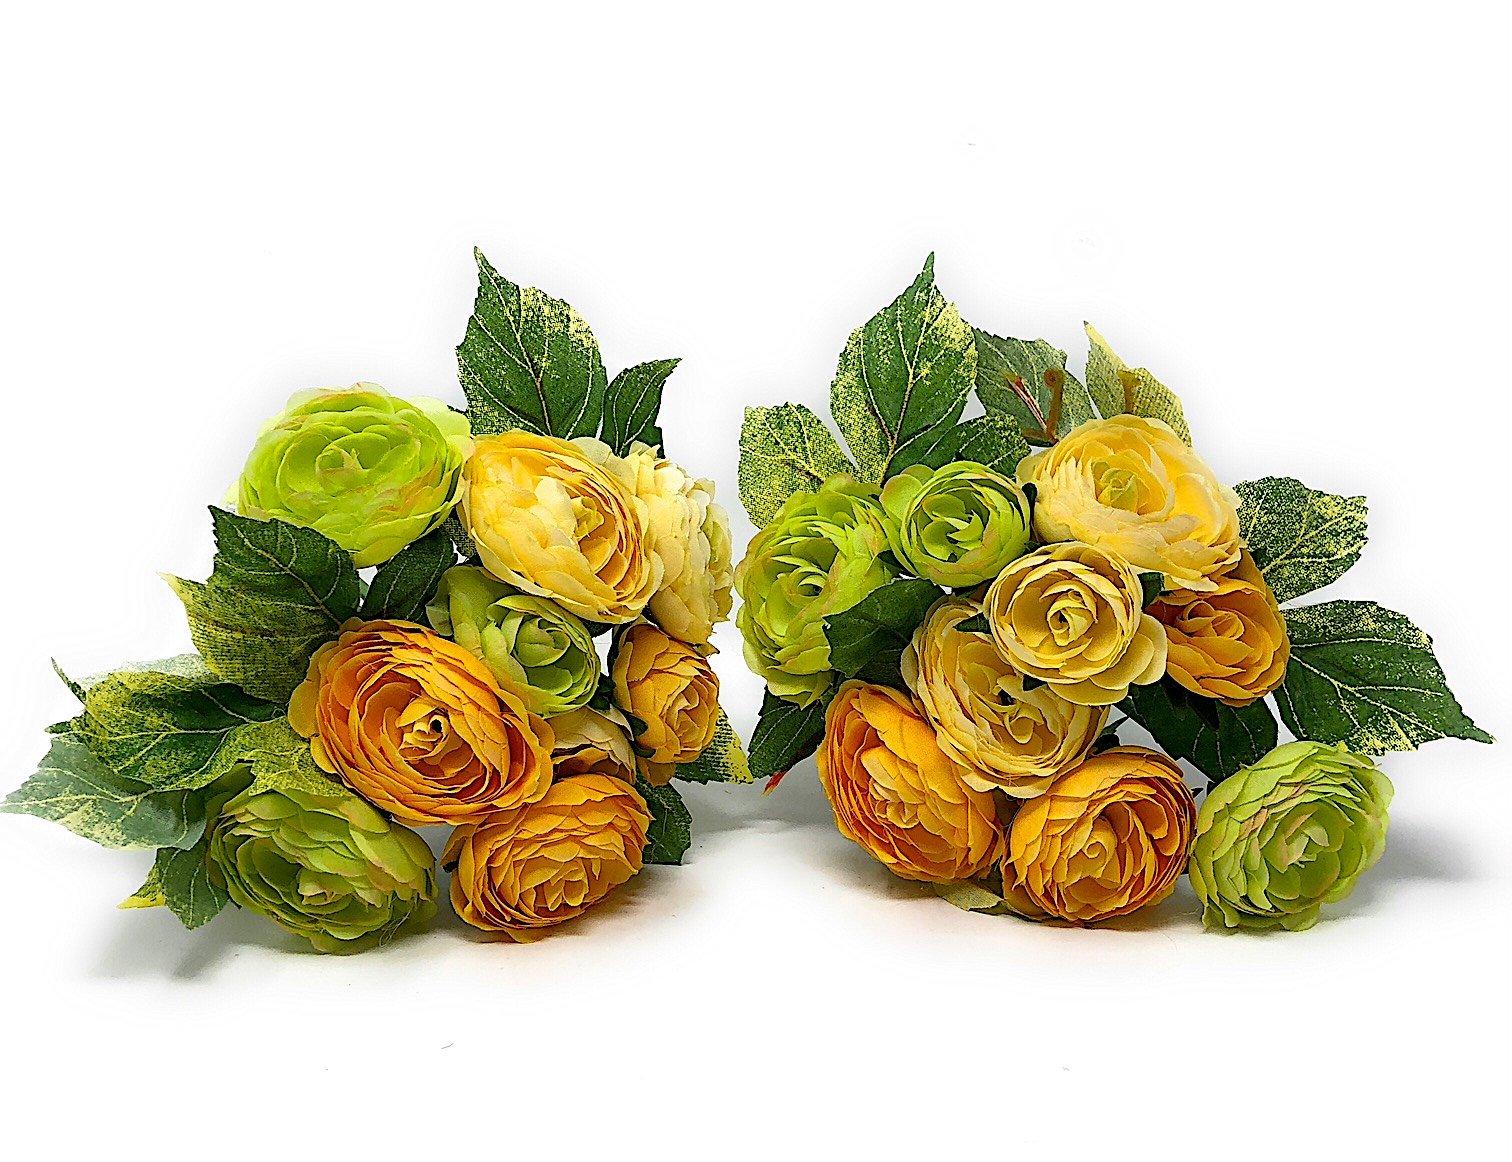 "RAZ Imports Set of 2 Artificial Flowers Bouquet Ranunculus Bundle Ornamental Wall Table Wedding Party Decoration Arrangements 8.5"" H (Creme/Yellow/Pale Green)"